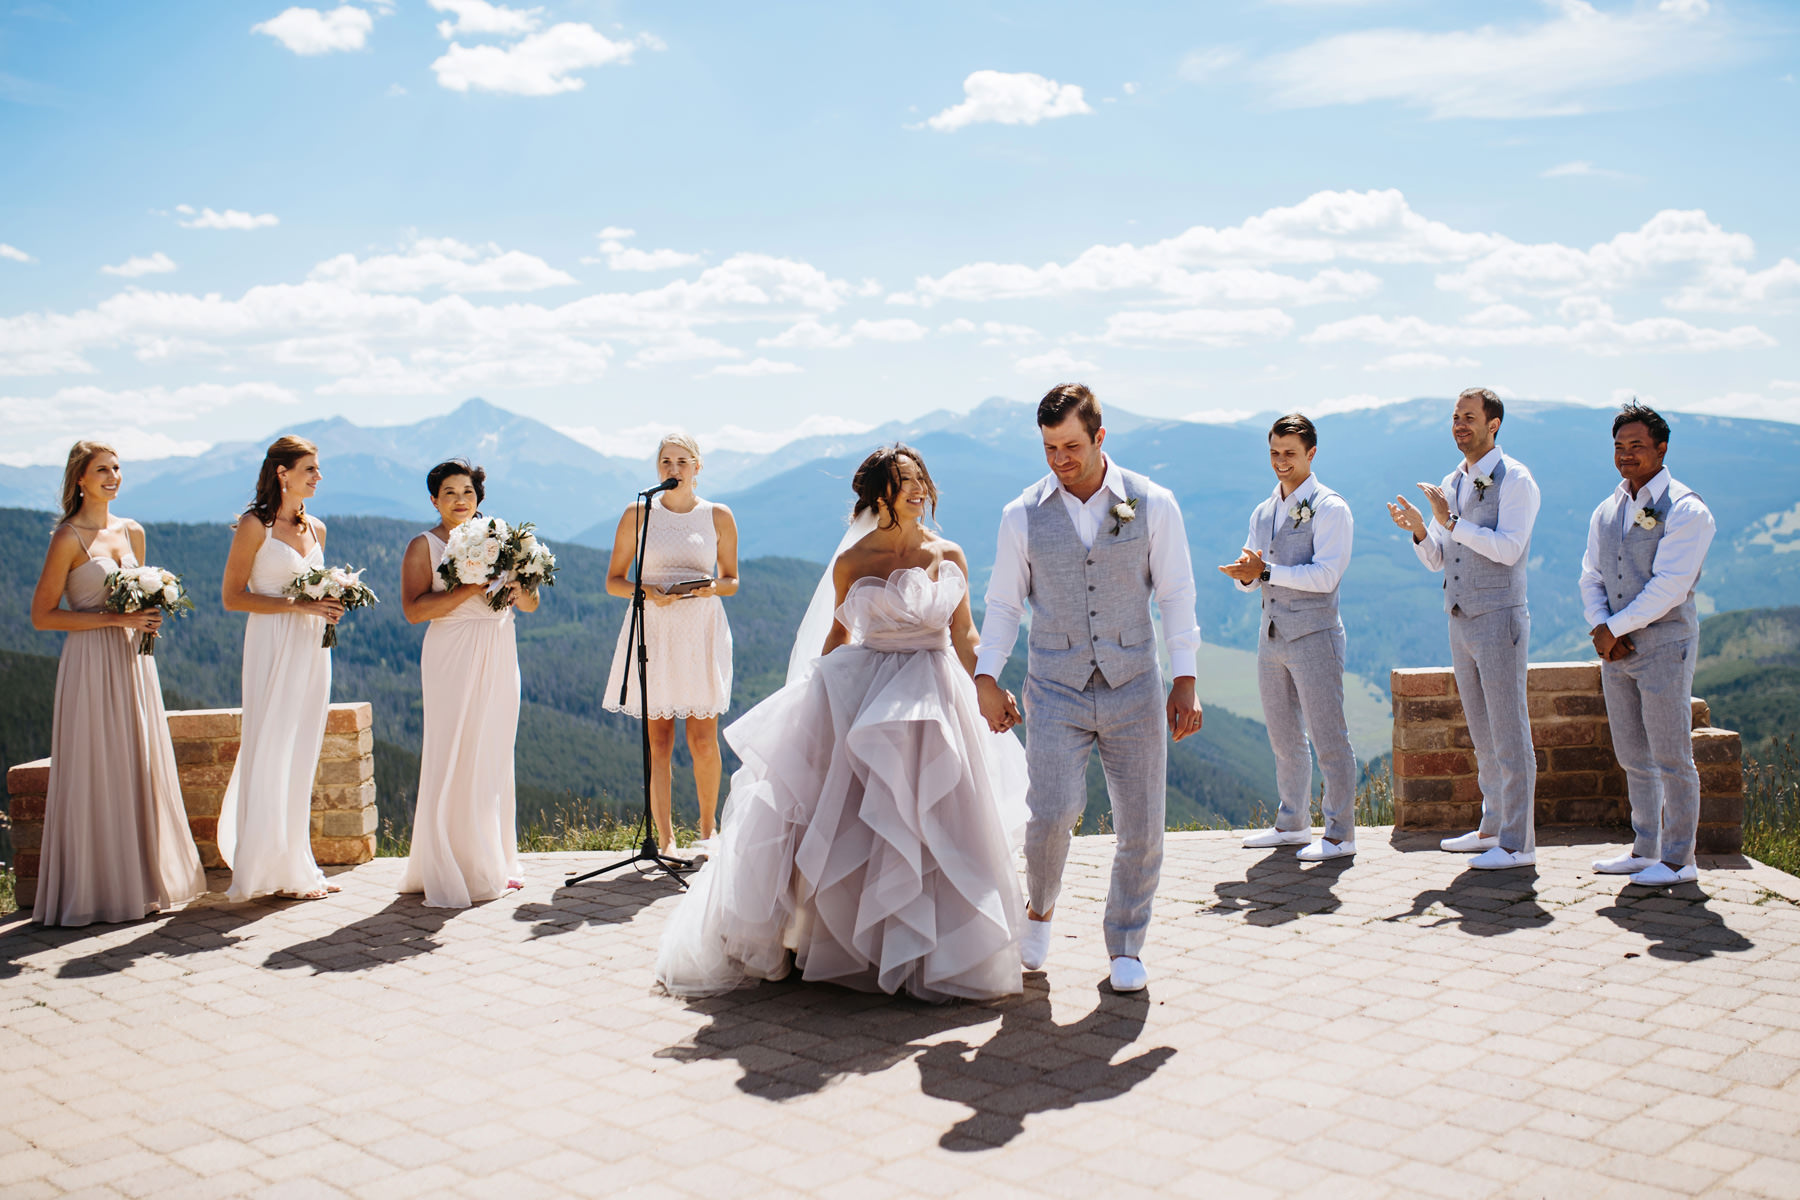 Vail Colorado Wedding Deck_ Kindling Wedding Photography40.JPG